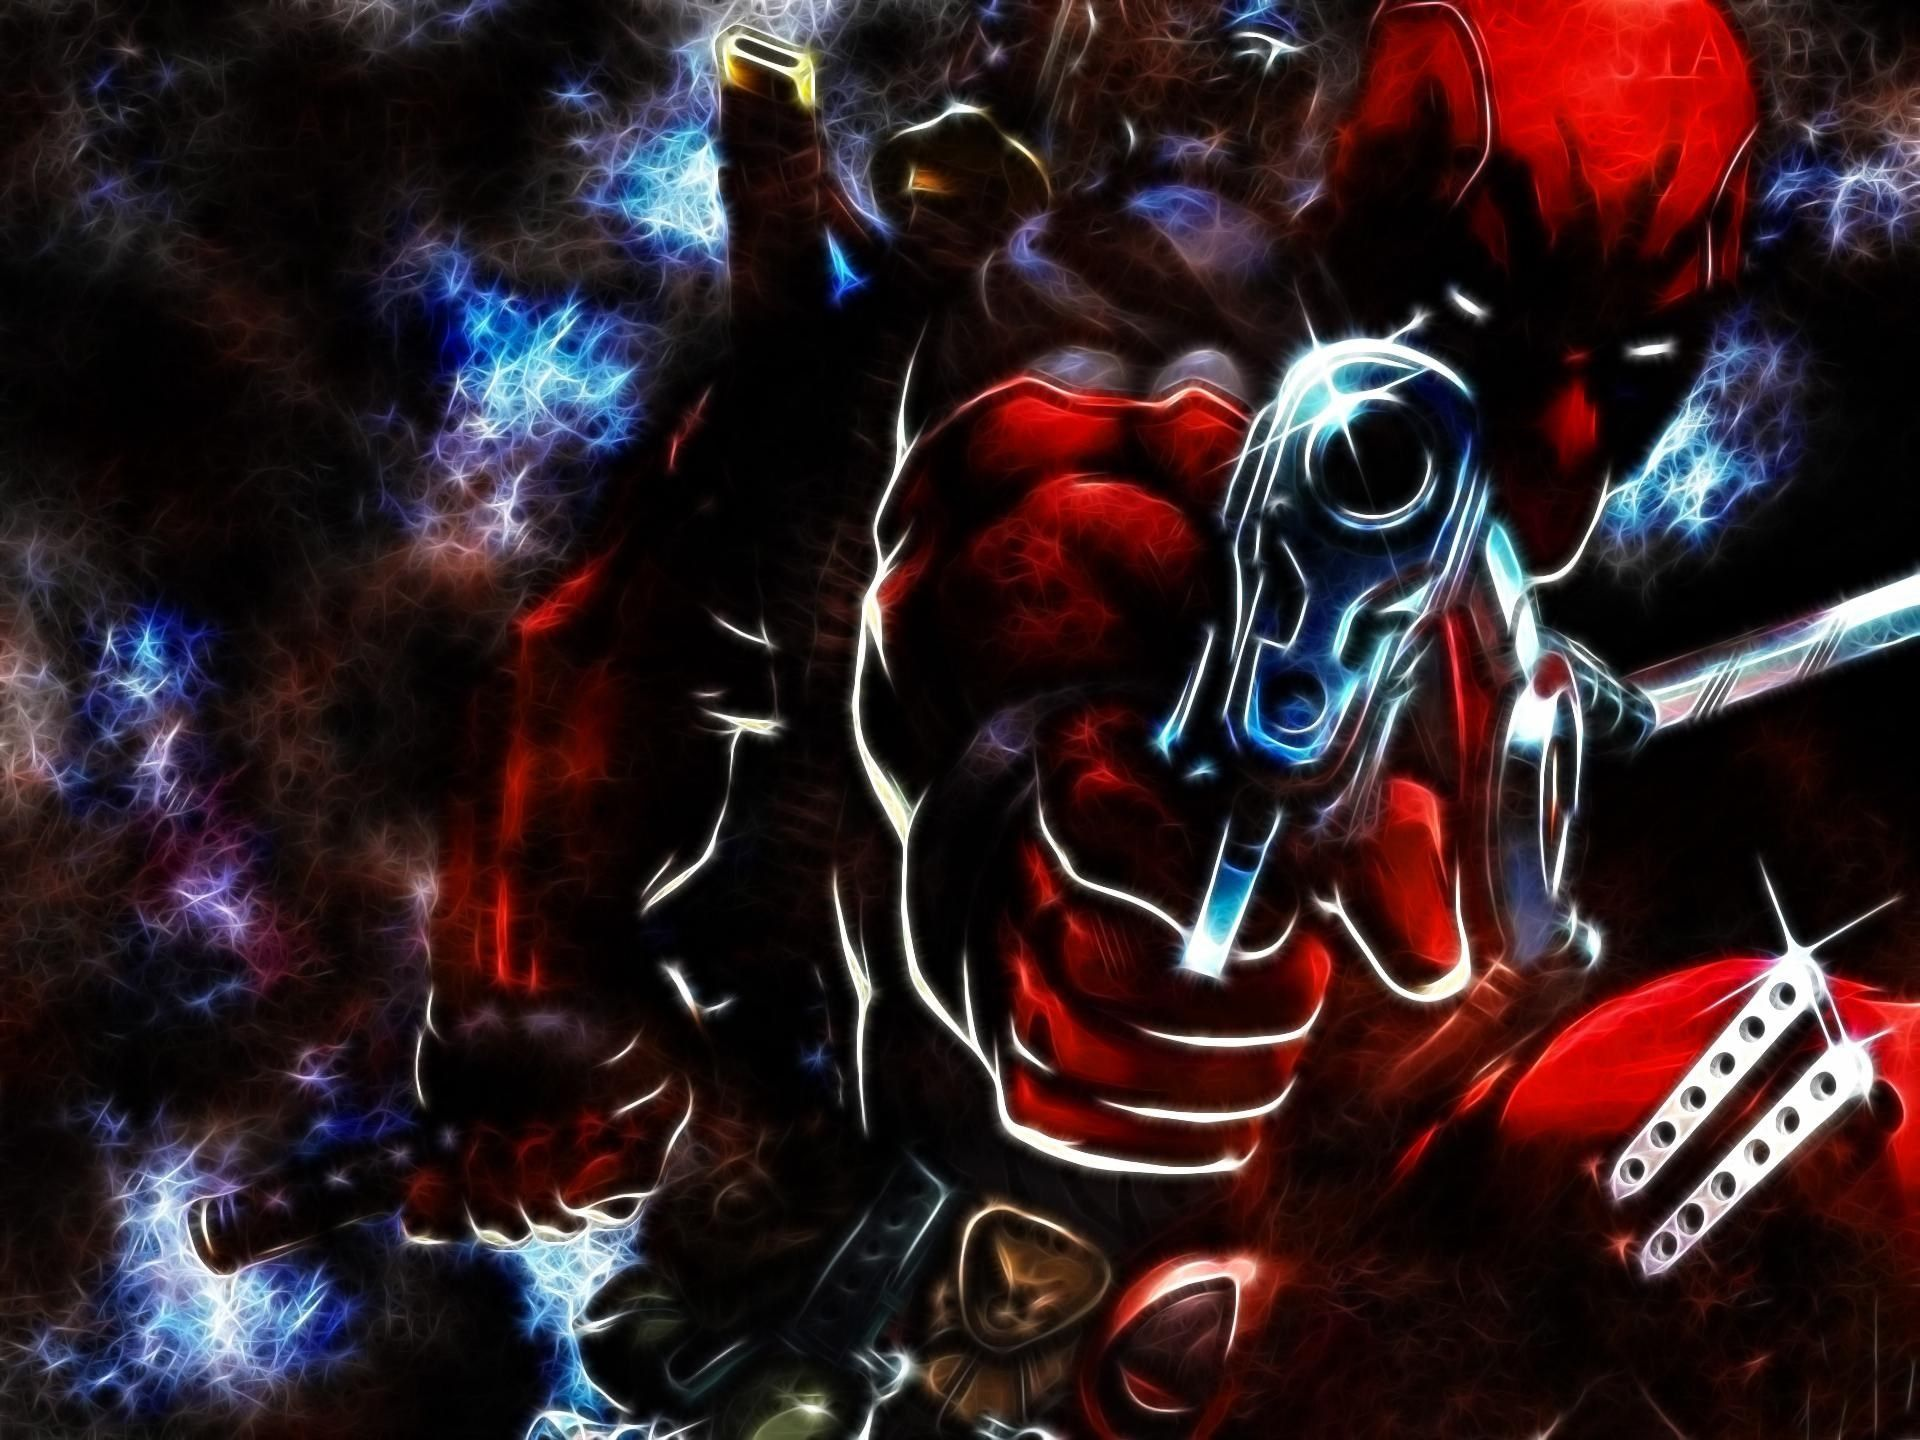 Deadpool Lock Screen Wallpapers Top Free Deadpool Lock Screen Backgrounds Wallpaperaccess